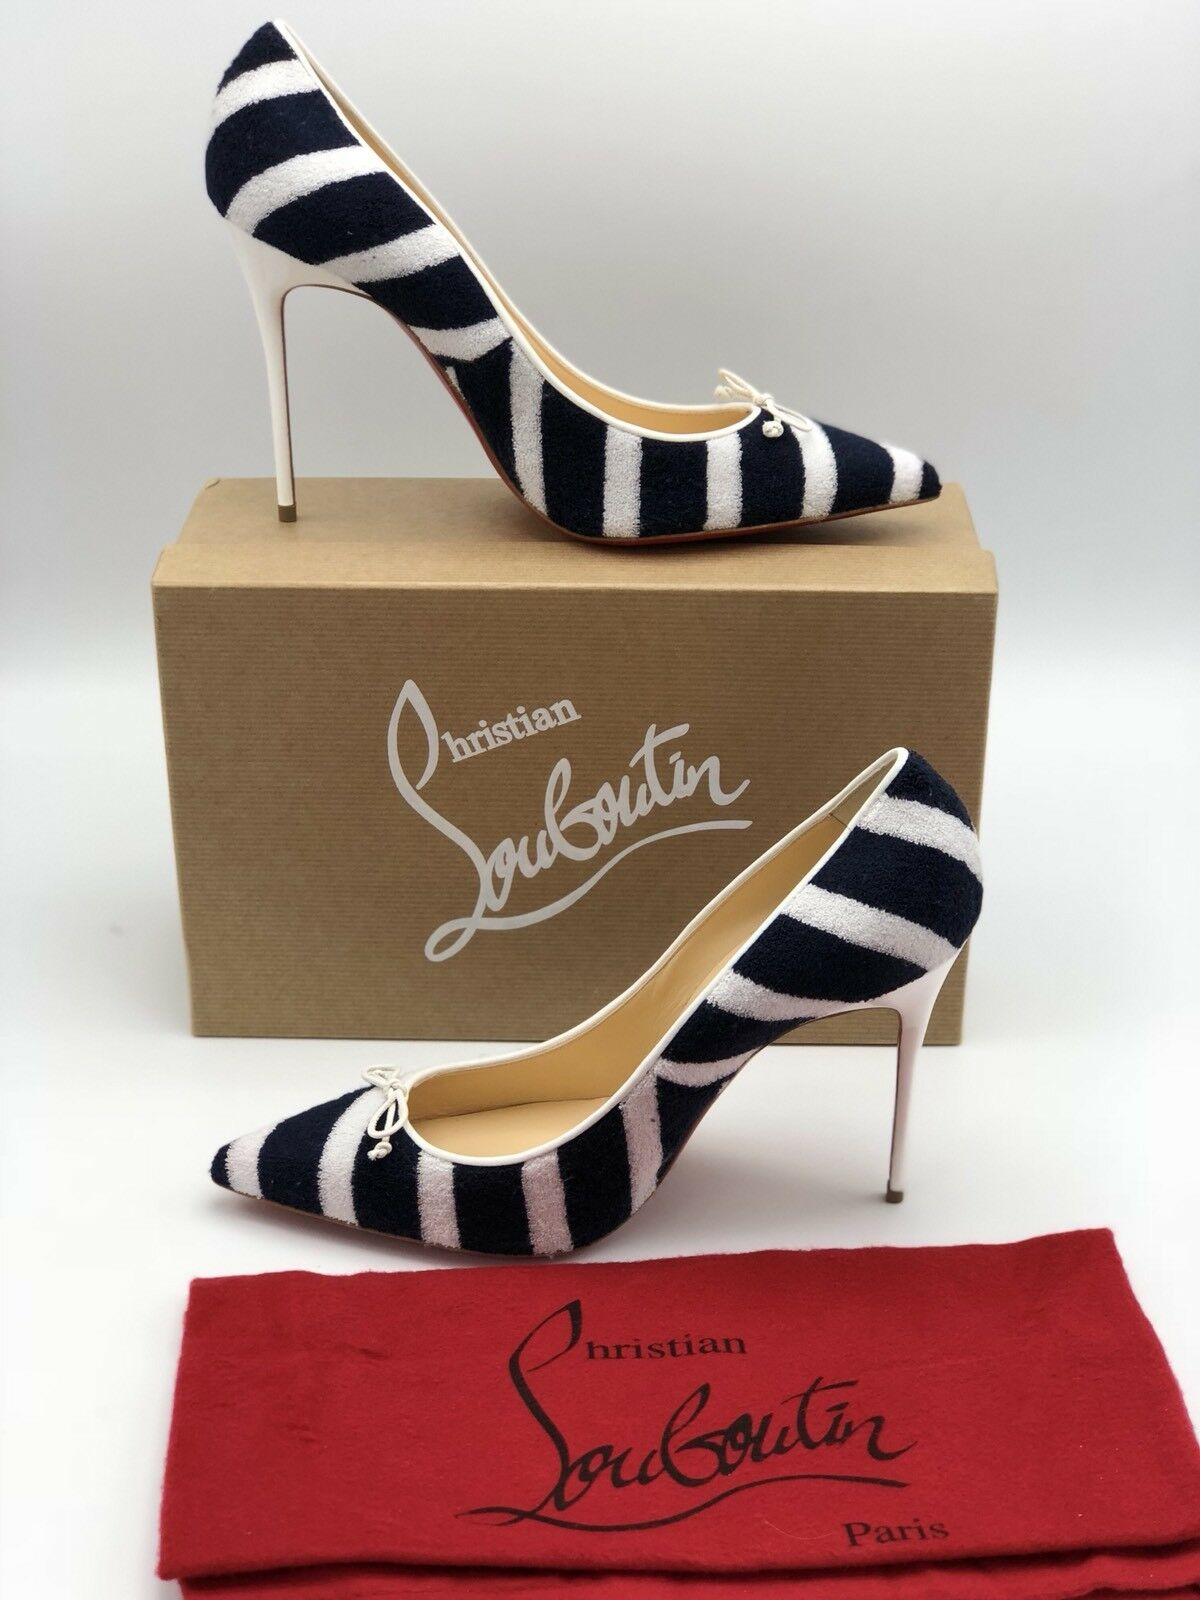 Christian Christian Christian Loubotin Grespa Open Toe shoes Sz. 39  895 100 Percent Authentic 88b354